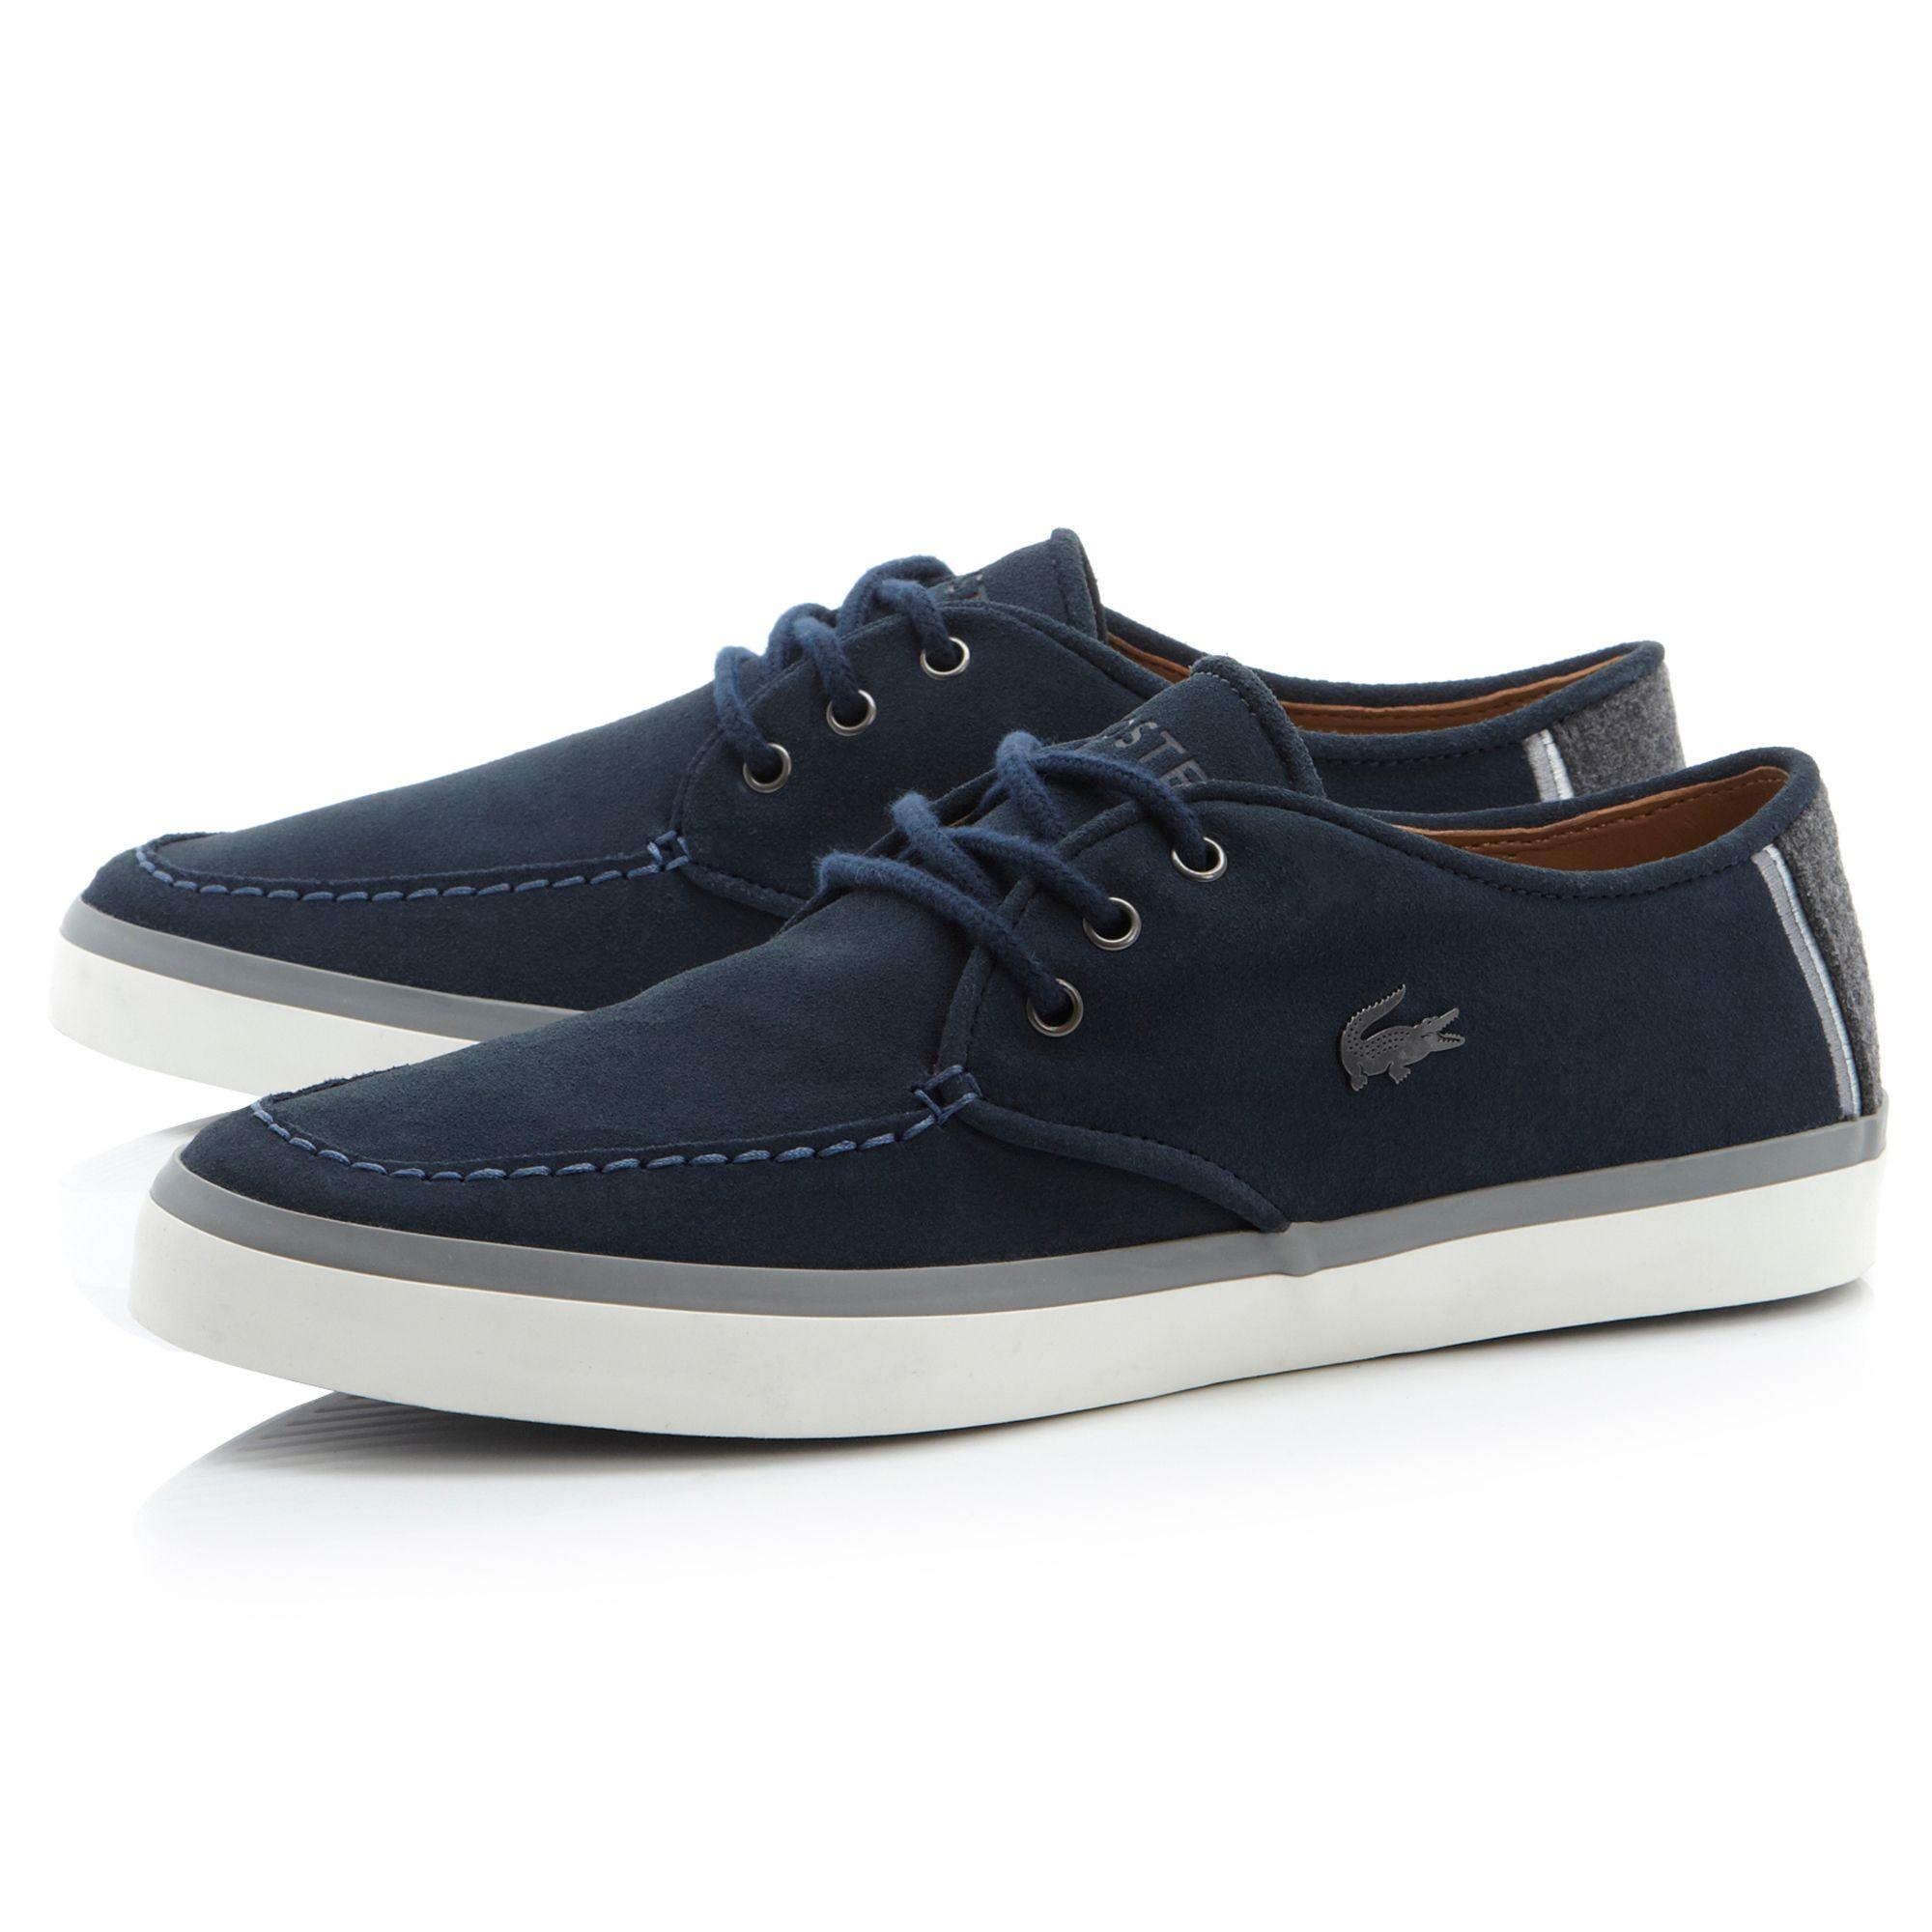 Lacoste Sneakers Sevrin Dark Blue Suede